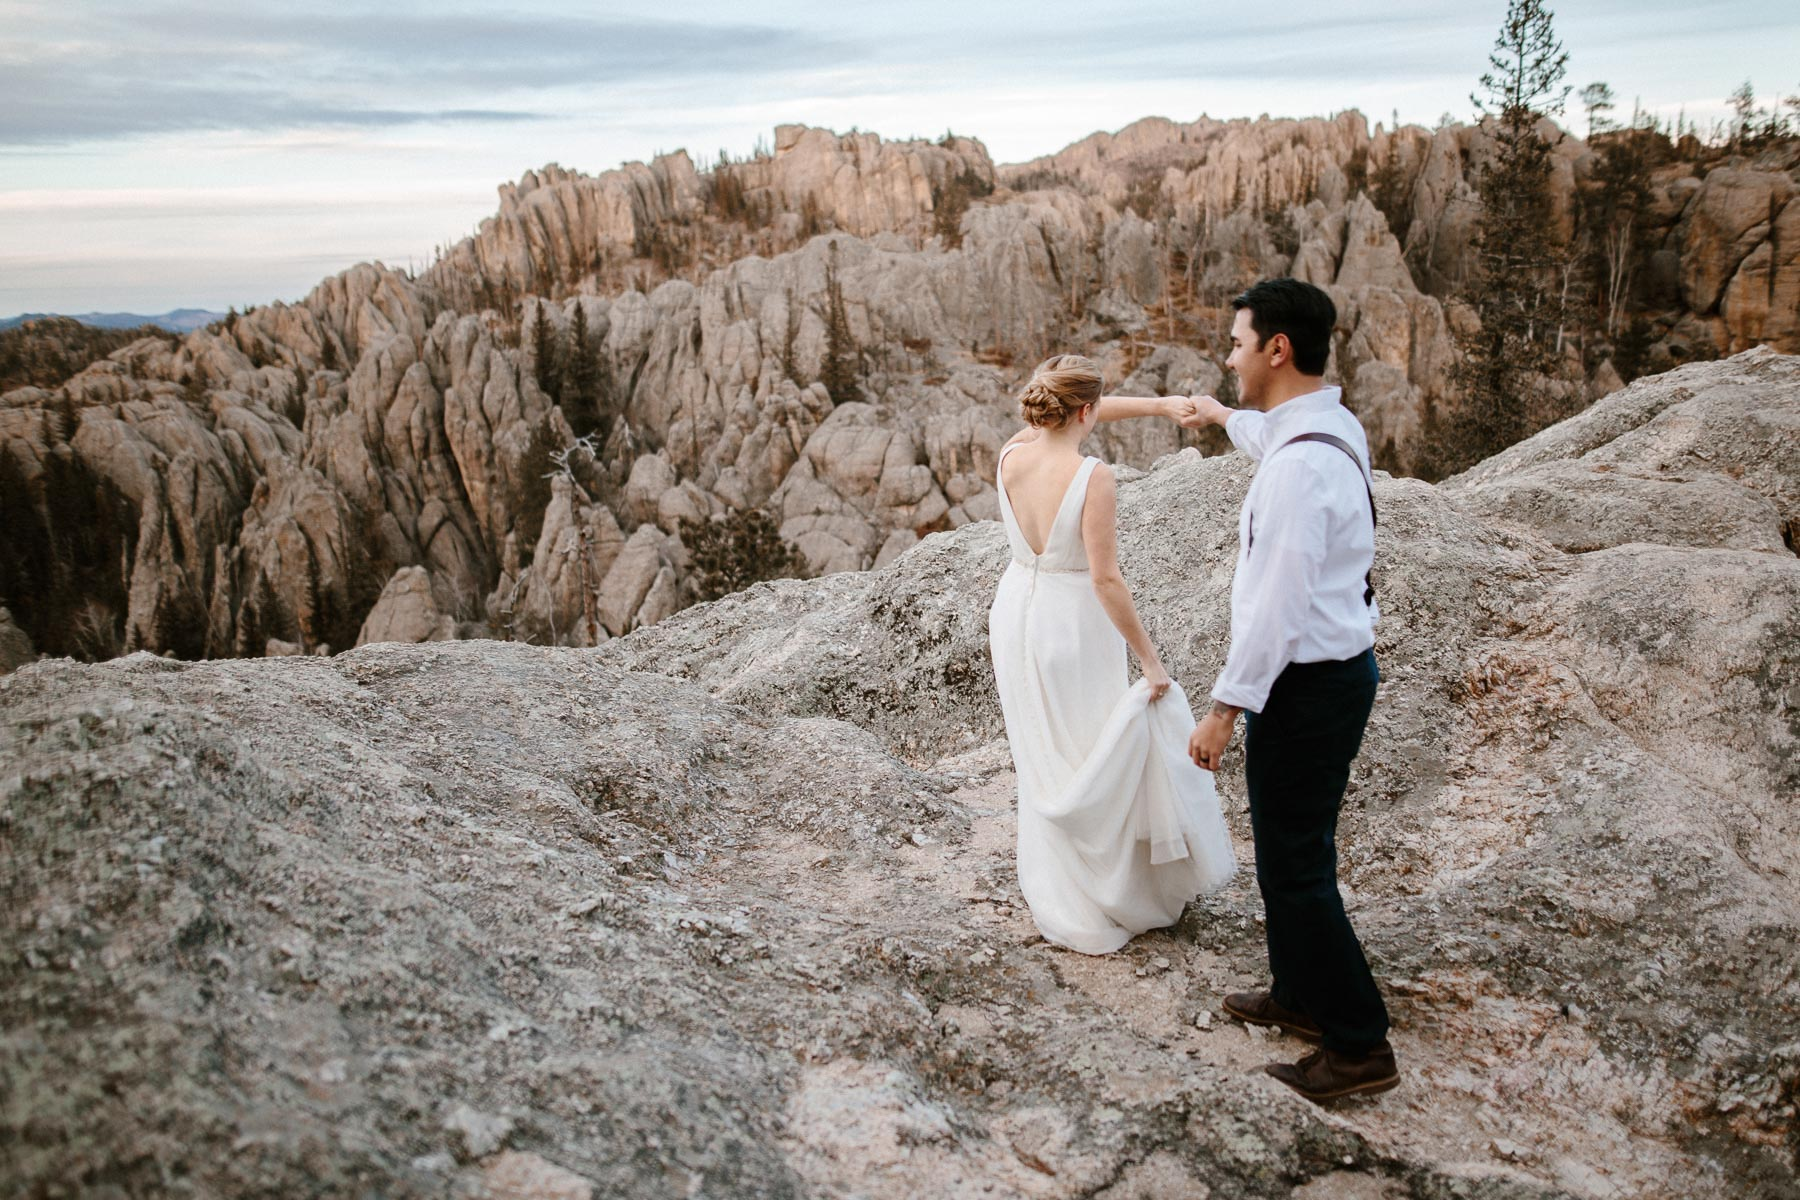 sioux-falls-black-hills-rapid-city-elopement-wedding-adventure-photographer-custer-sylvan-lake-45.jpg